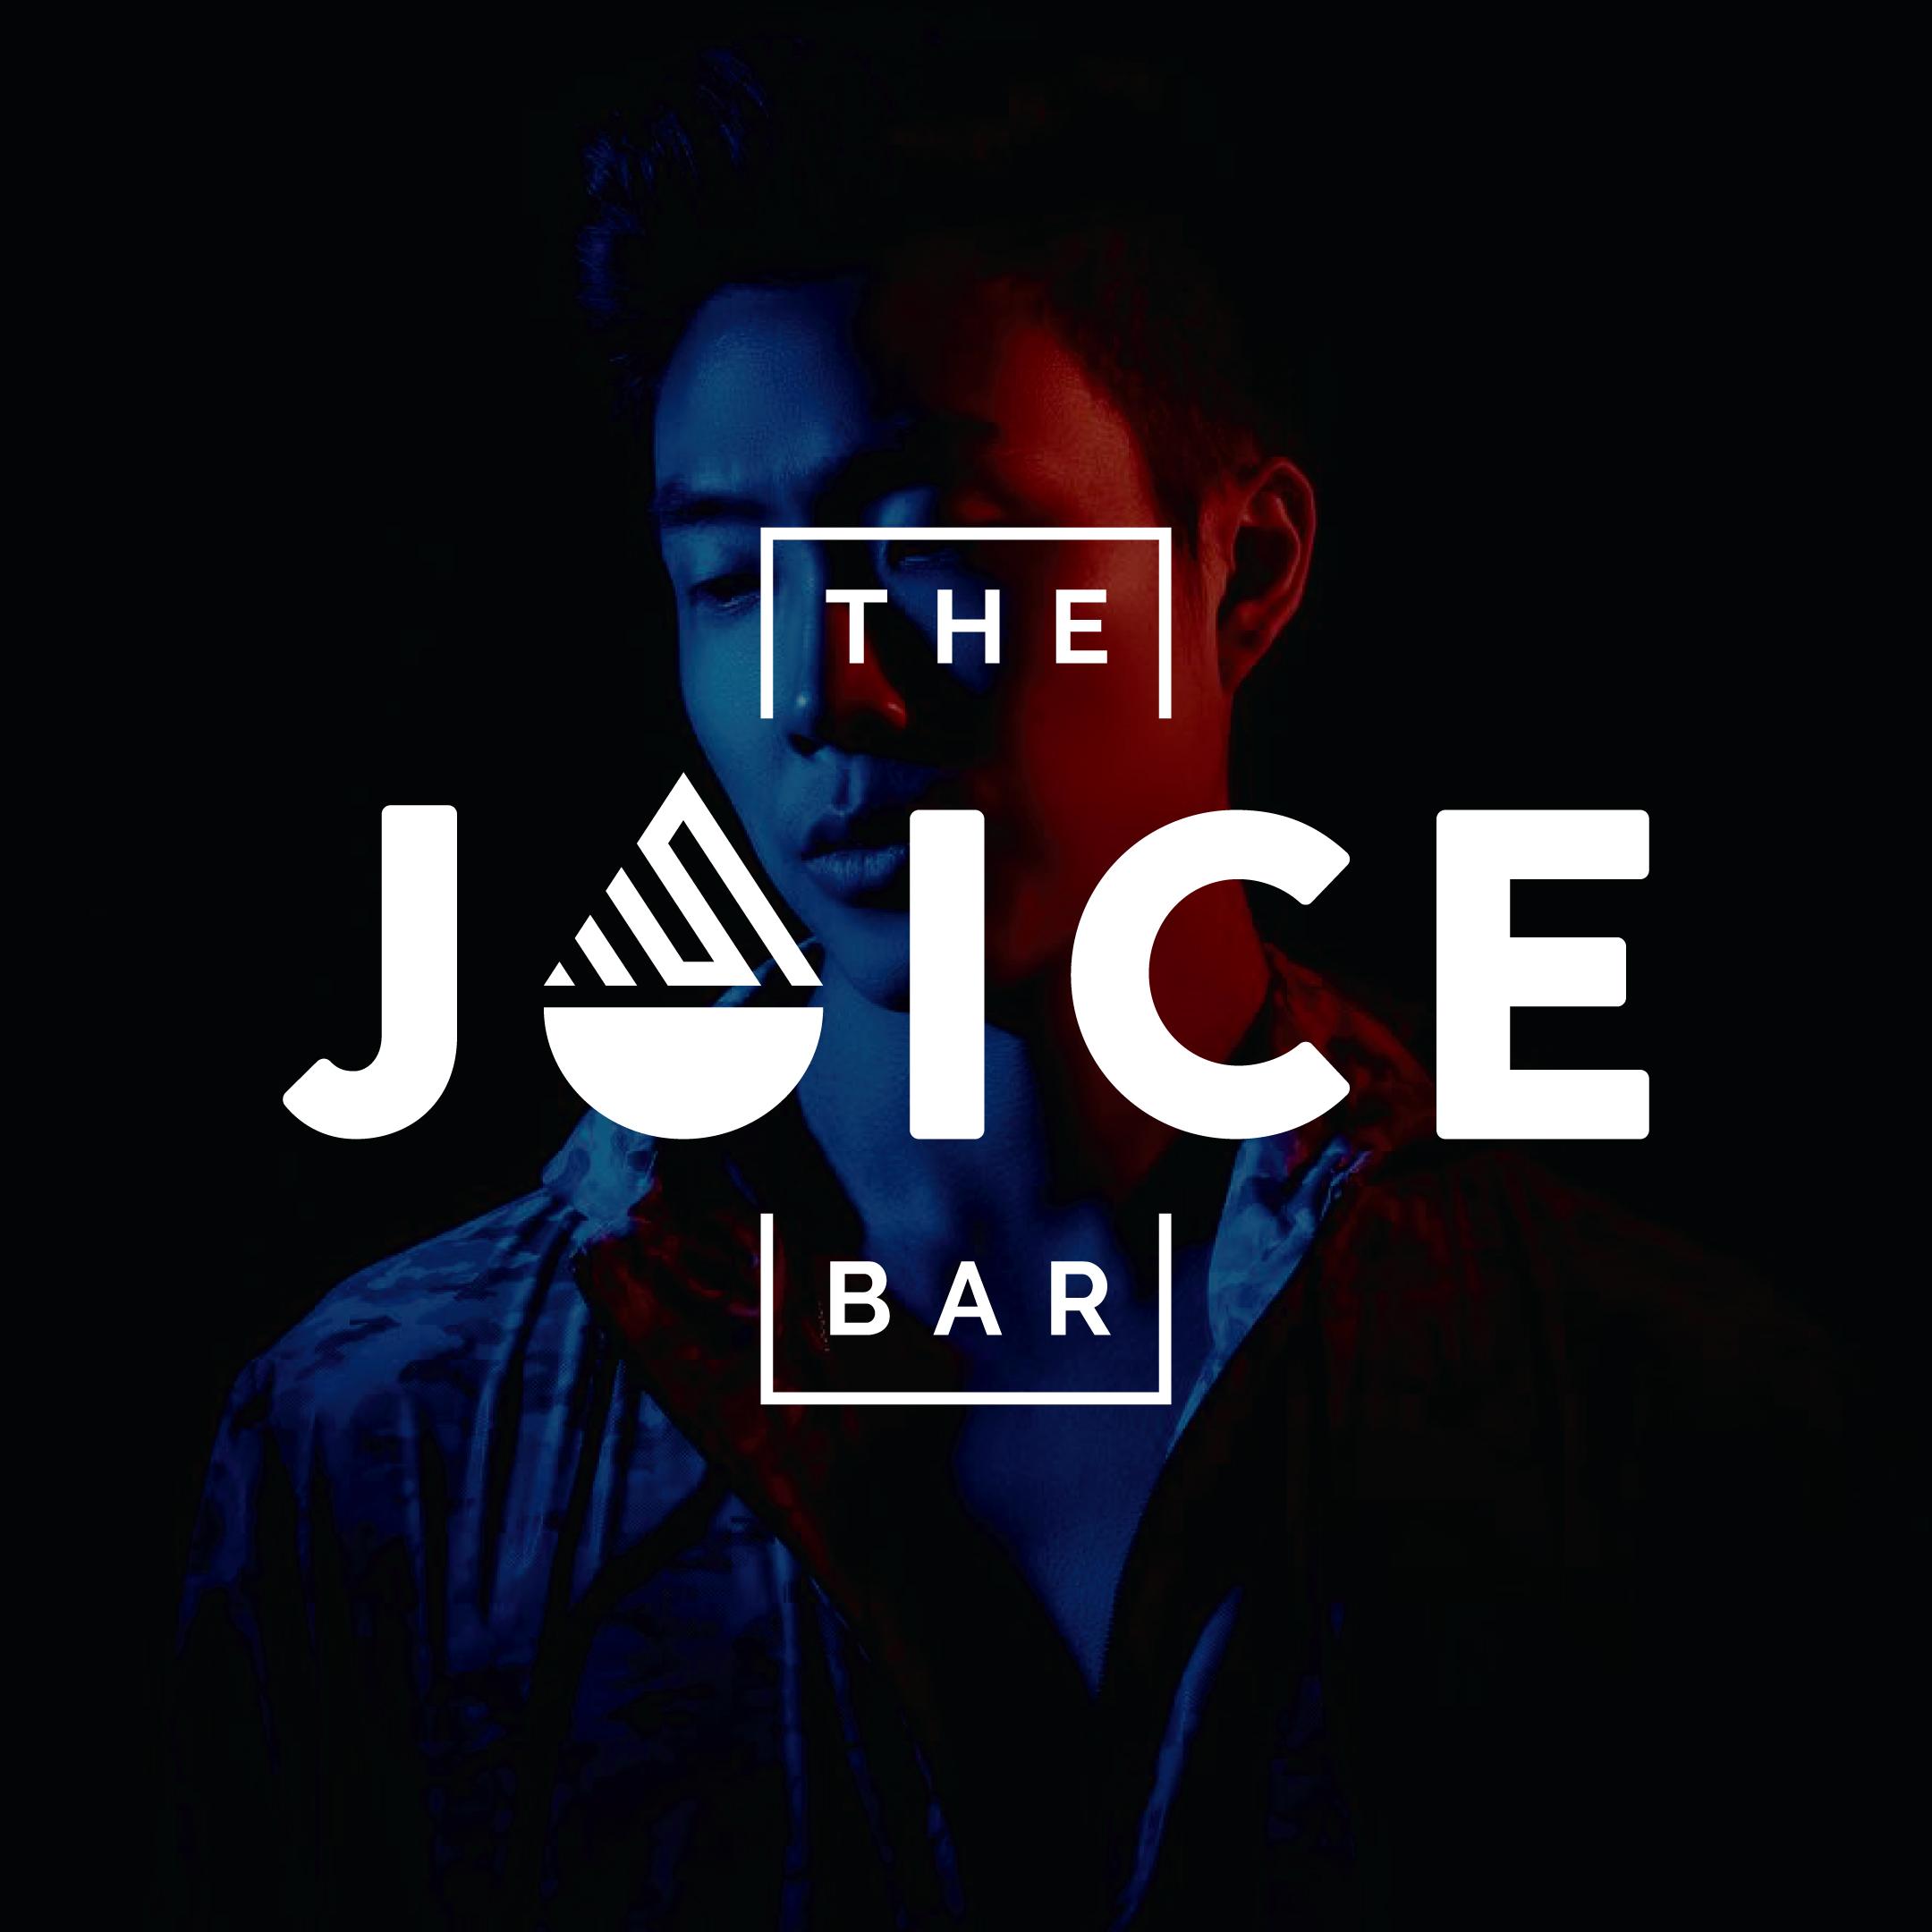 The Juice Bar Dave Jy Lee